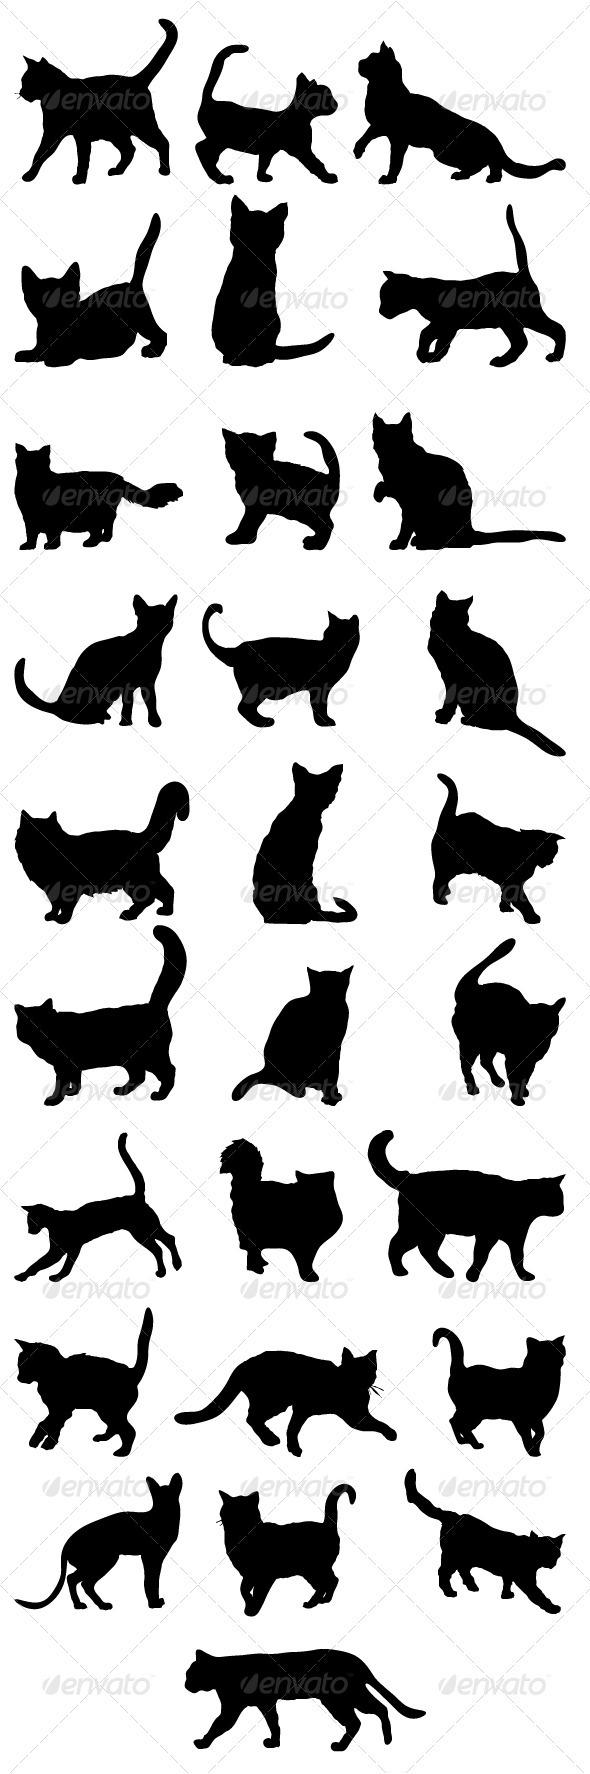 Big Cat clipart female cat Pack Silhouettes Cats Big 2